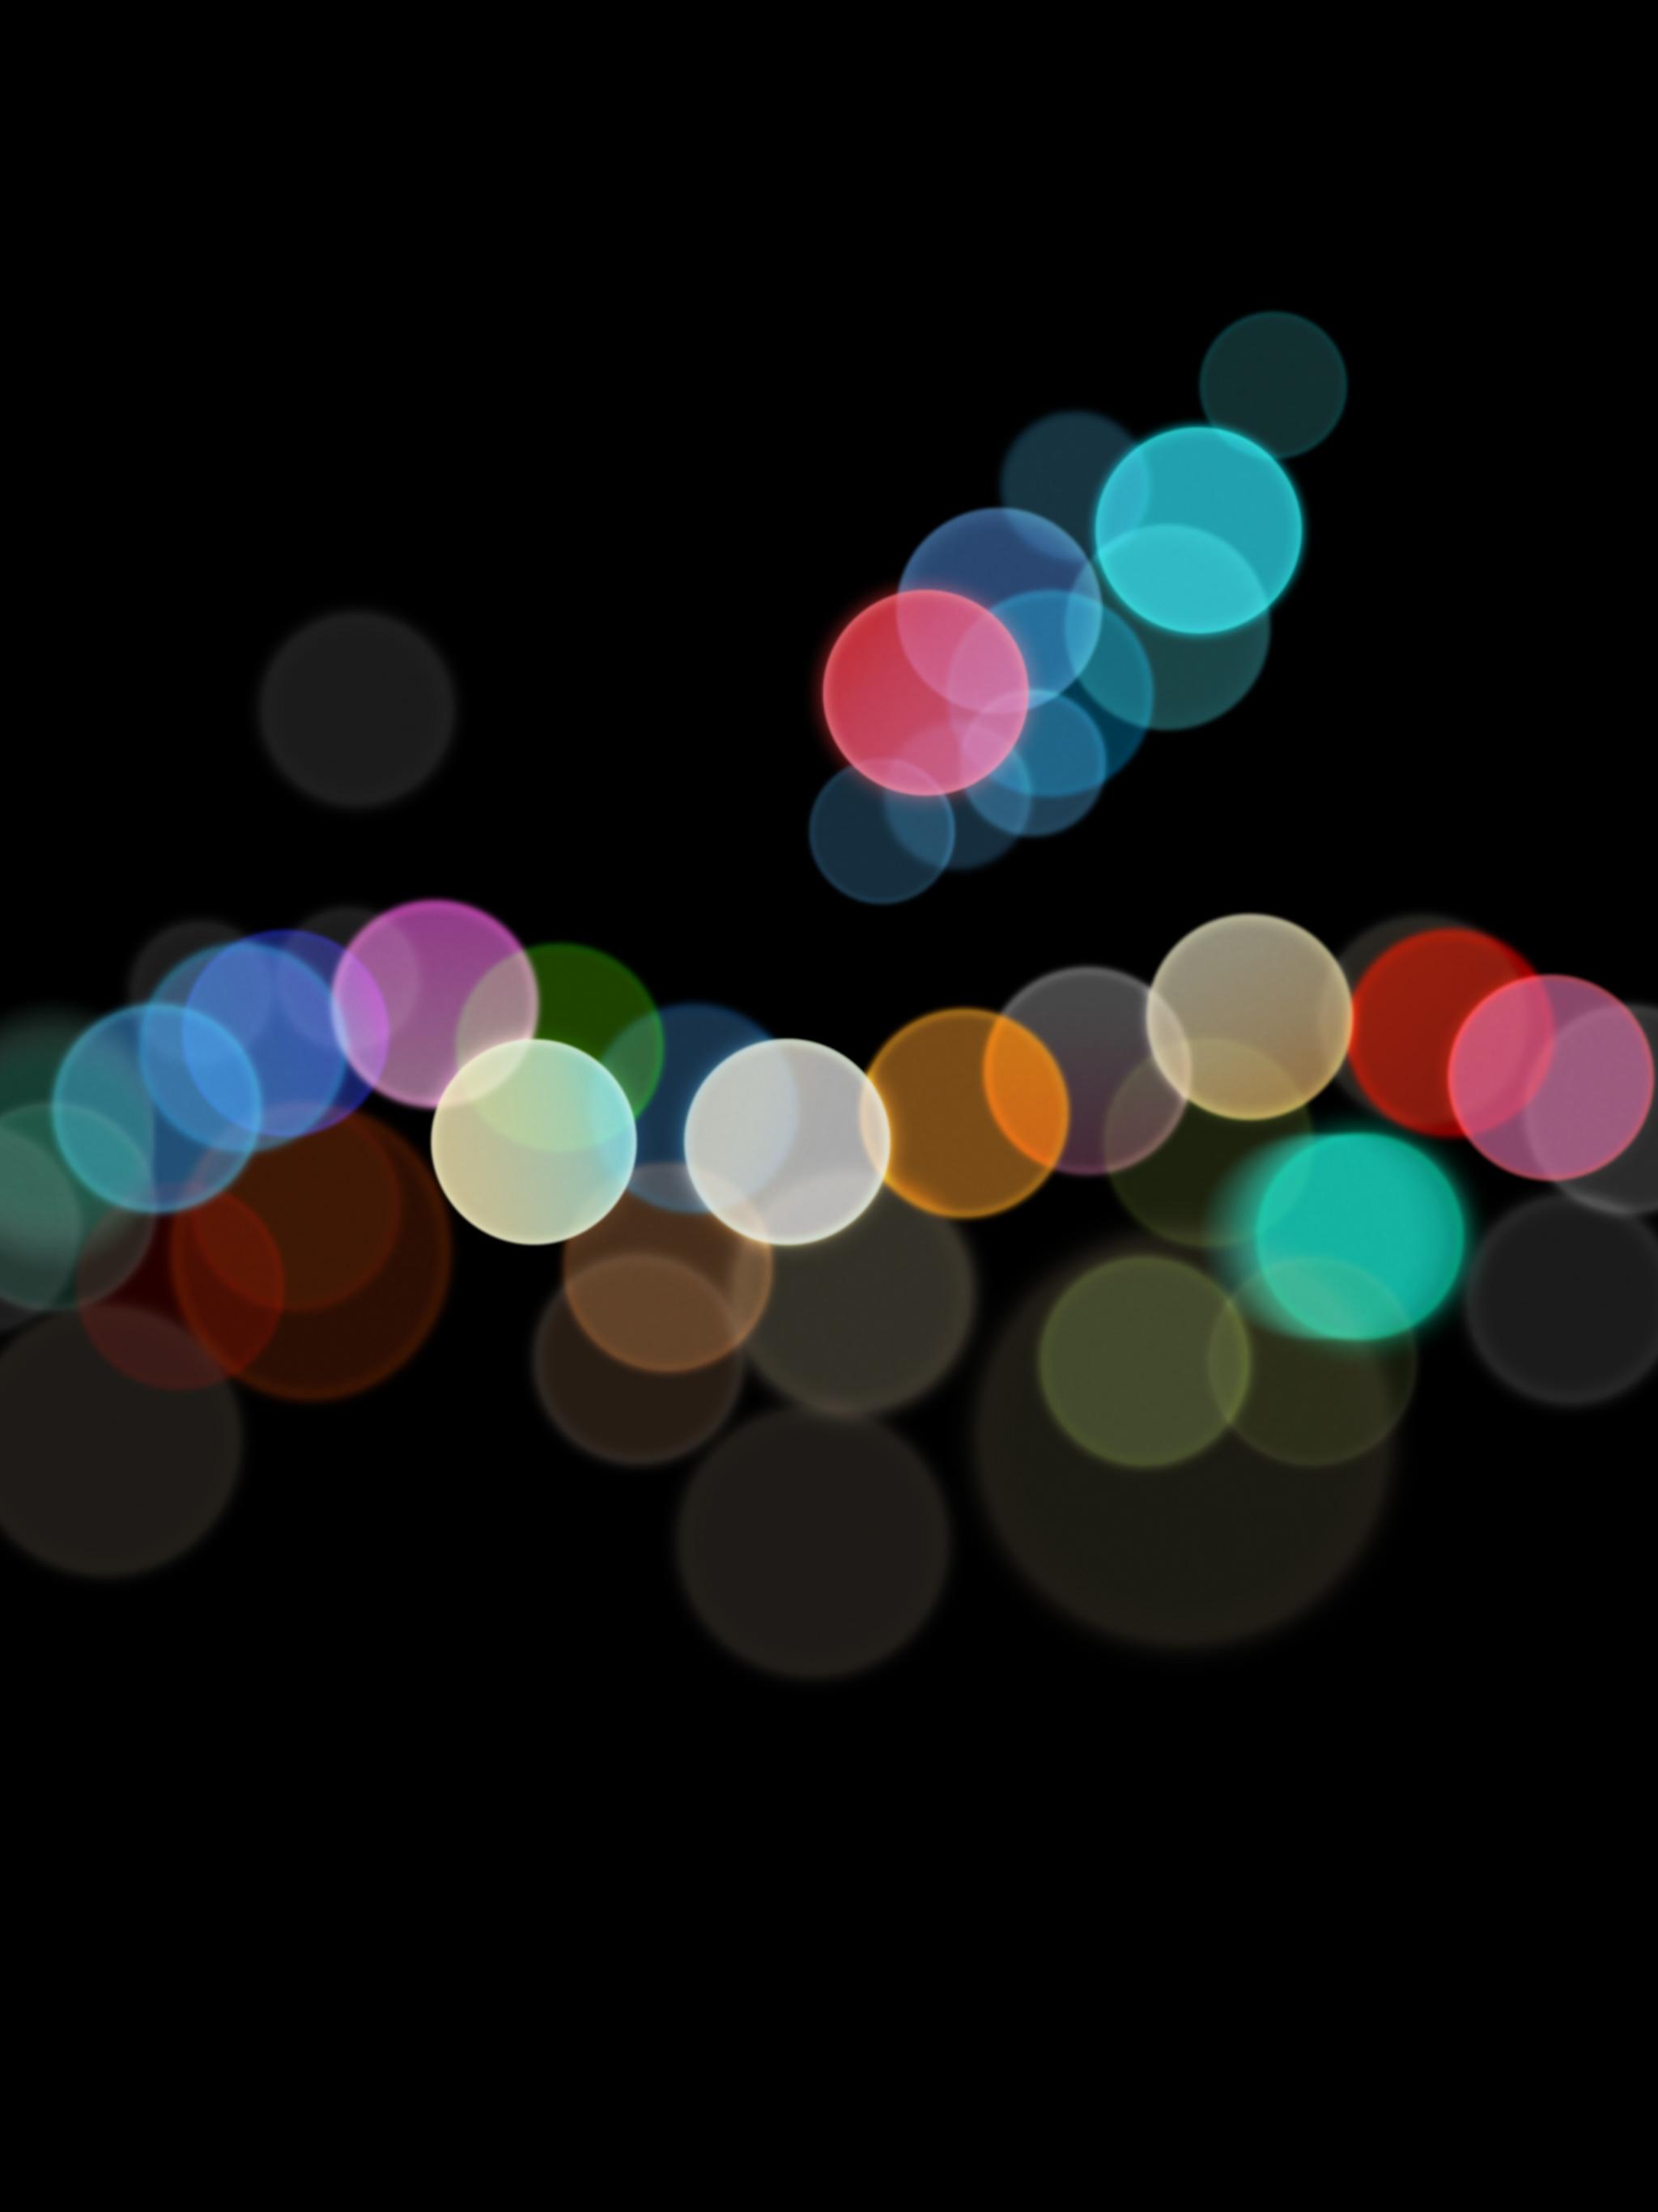 900+ Wallpaper Apple 7 HD Paling Baru